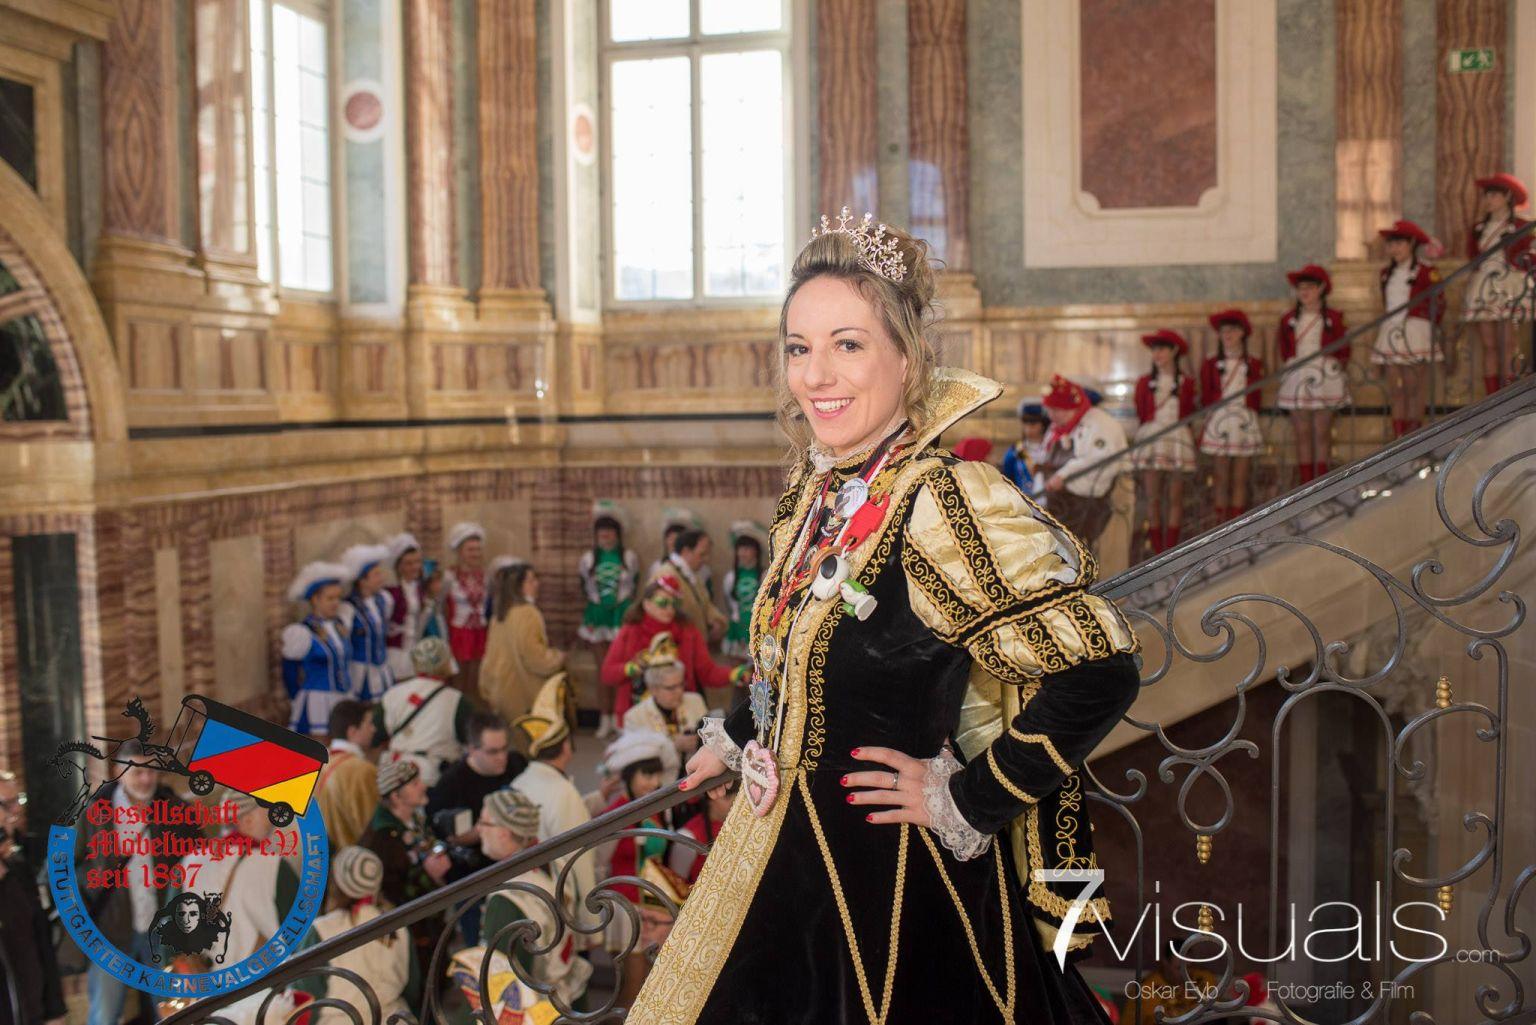 mw-empfang-minister-strobl-2018-016.jpg